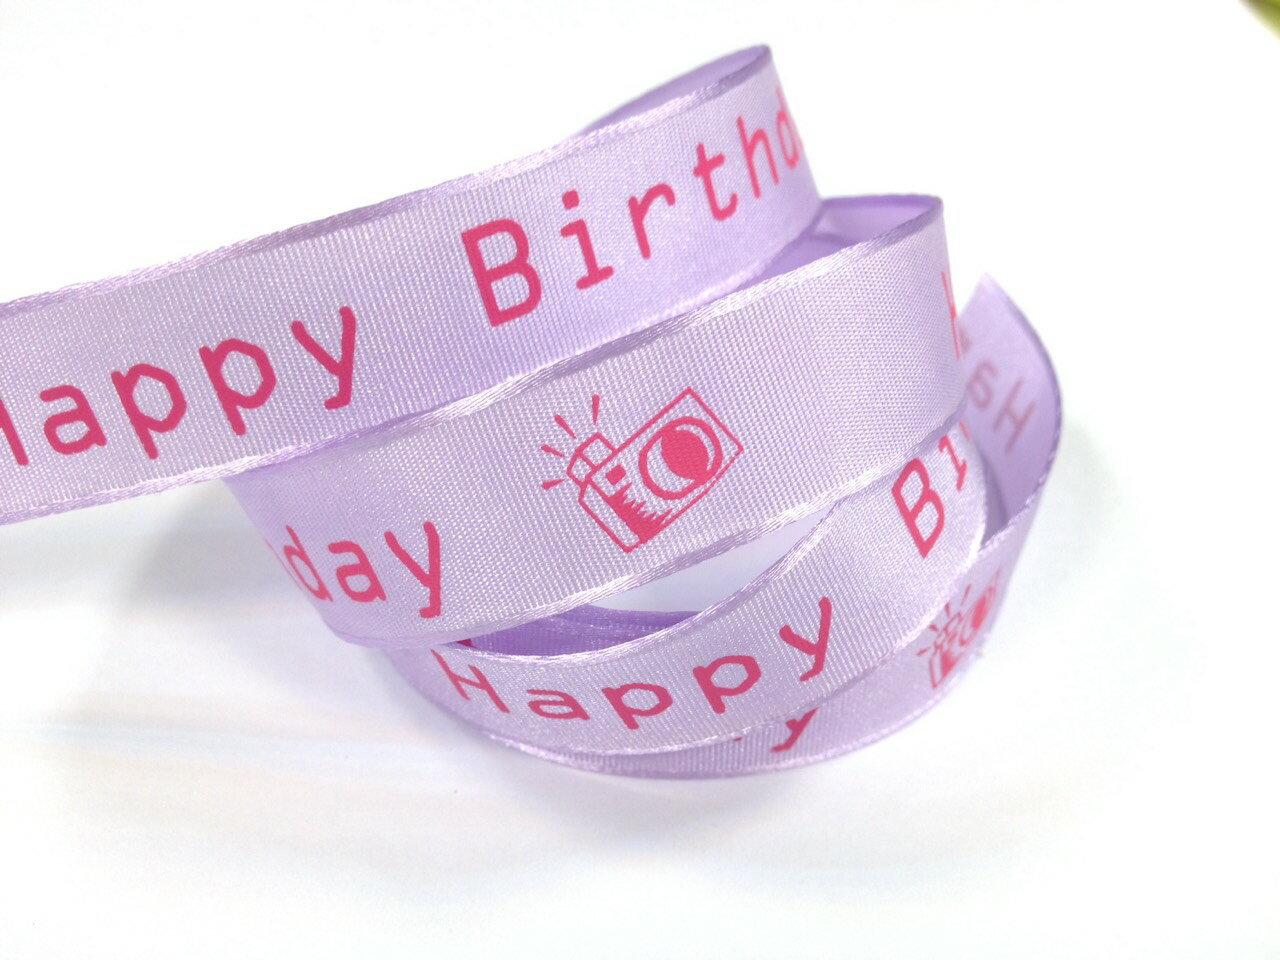 【Crystal Rose緞帶專賣店】平織帶生日快樂-相機 1